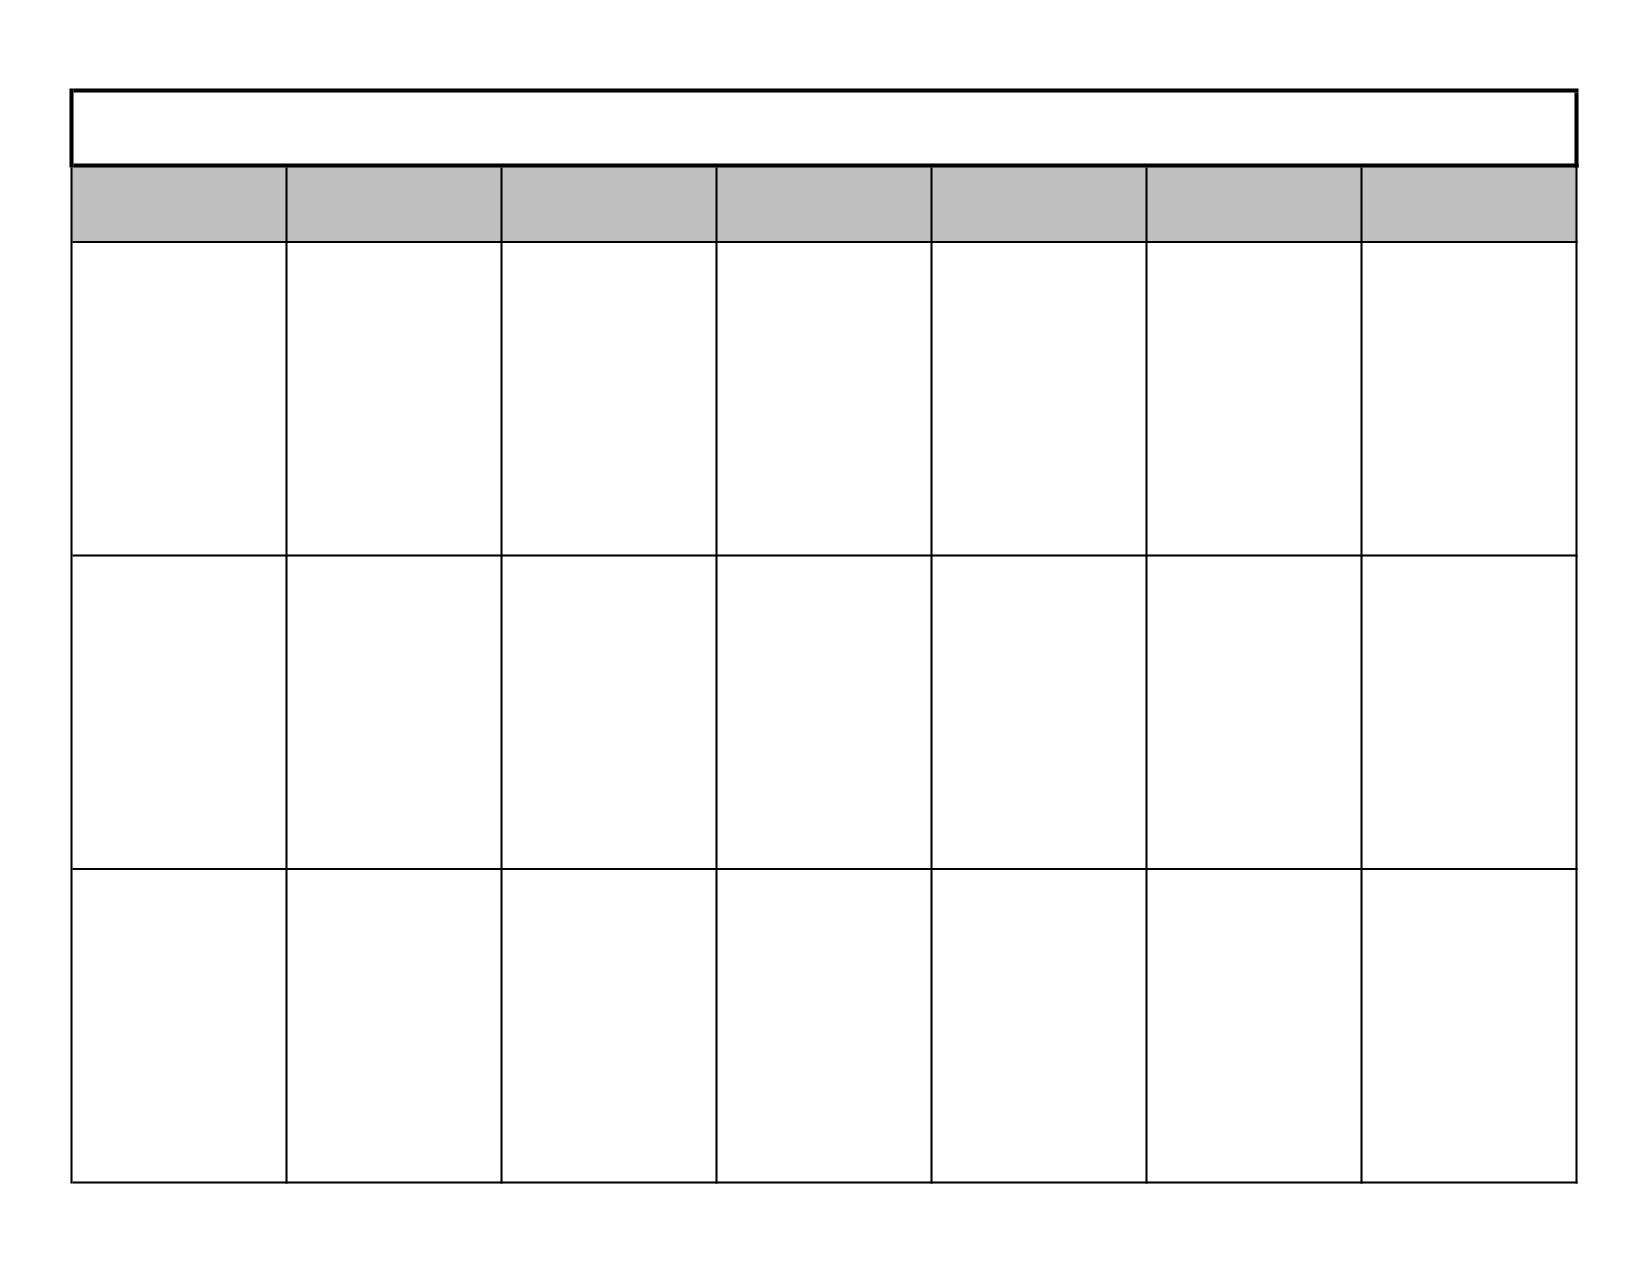 Free Calendar Templates Fotolip Rich Image And Wallpaper  Xjb